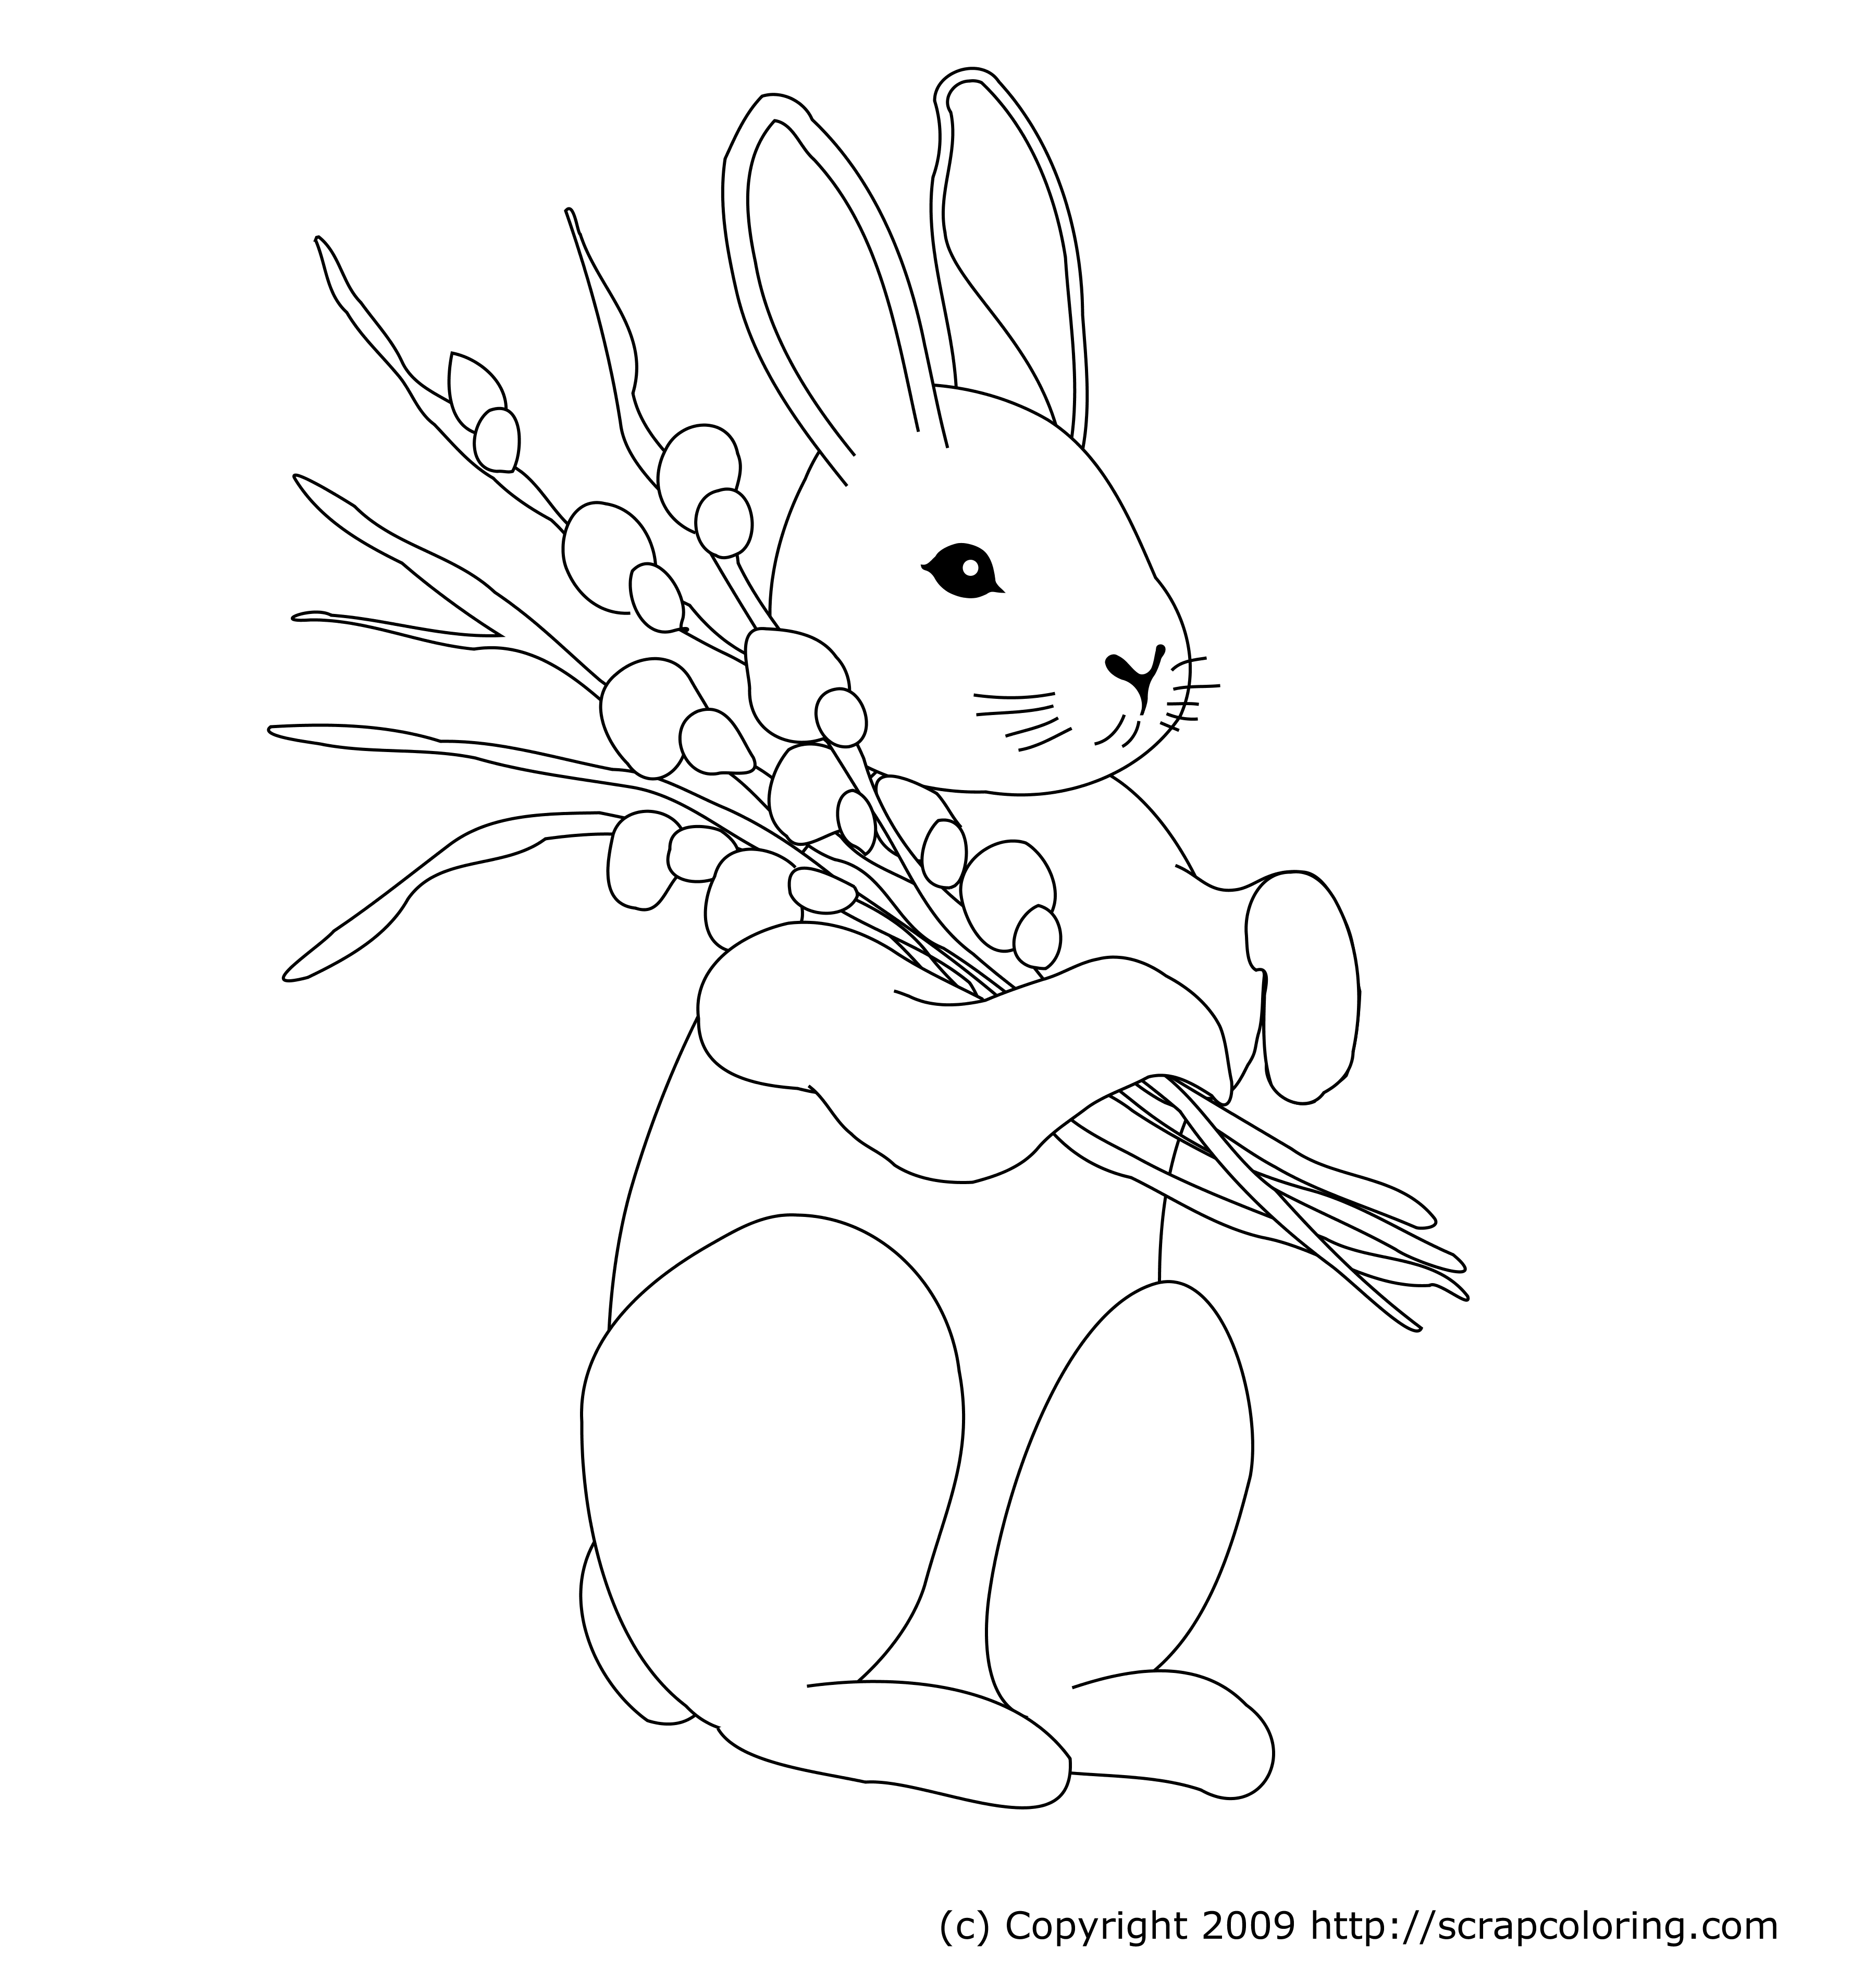 Dessin gratuit lapin a imprimer